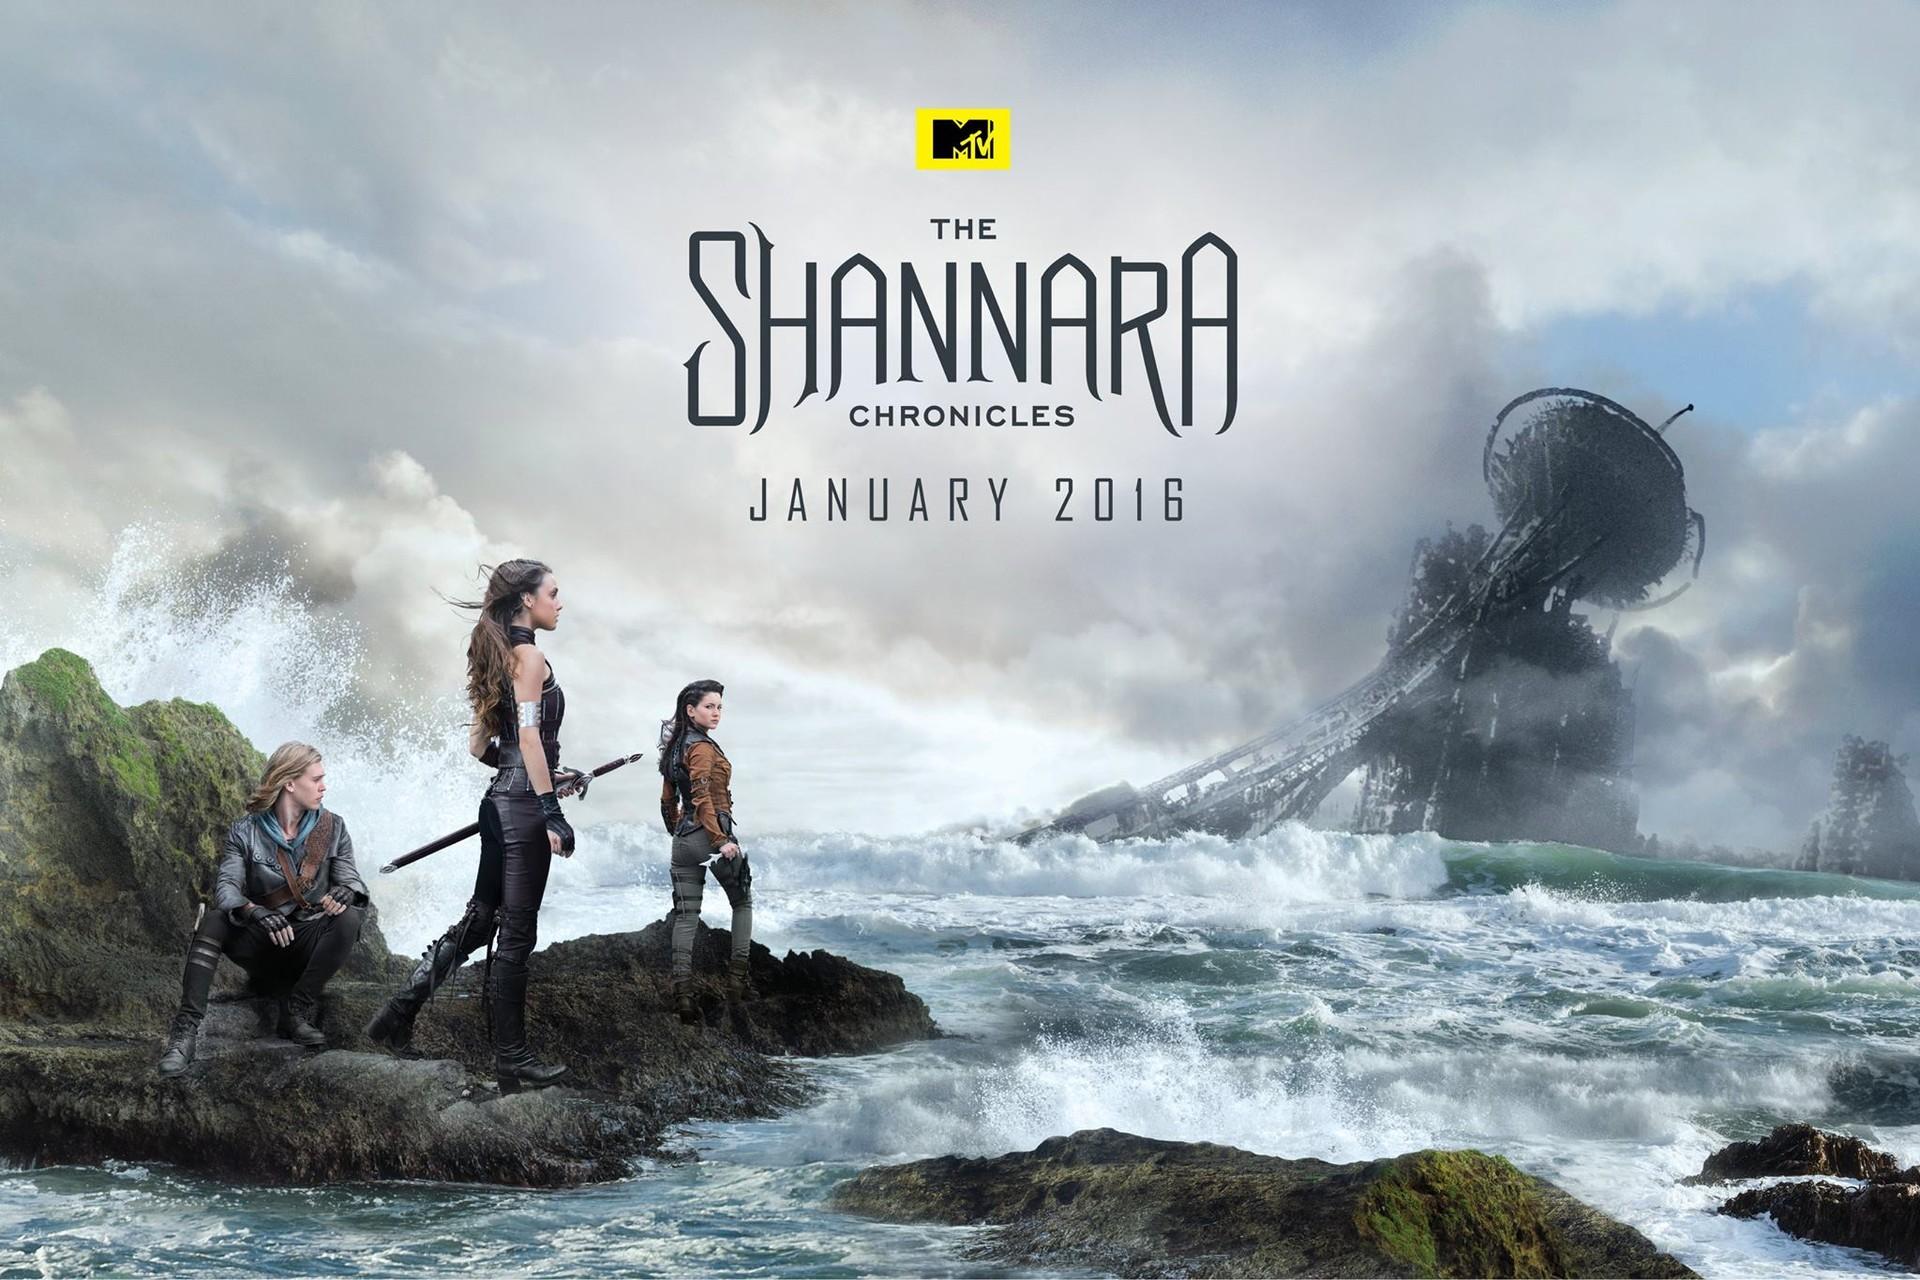 Paul gerrard the shannara chronicles poster